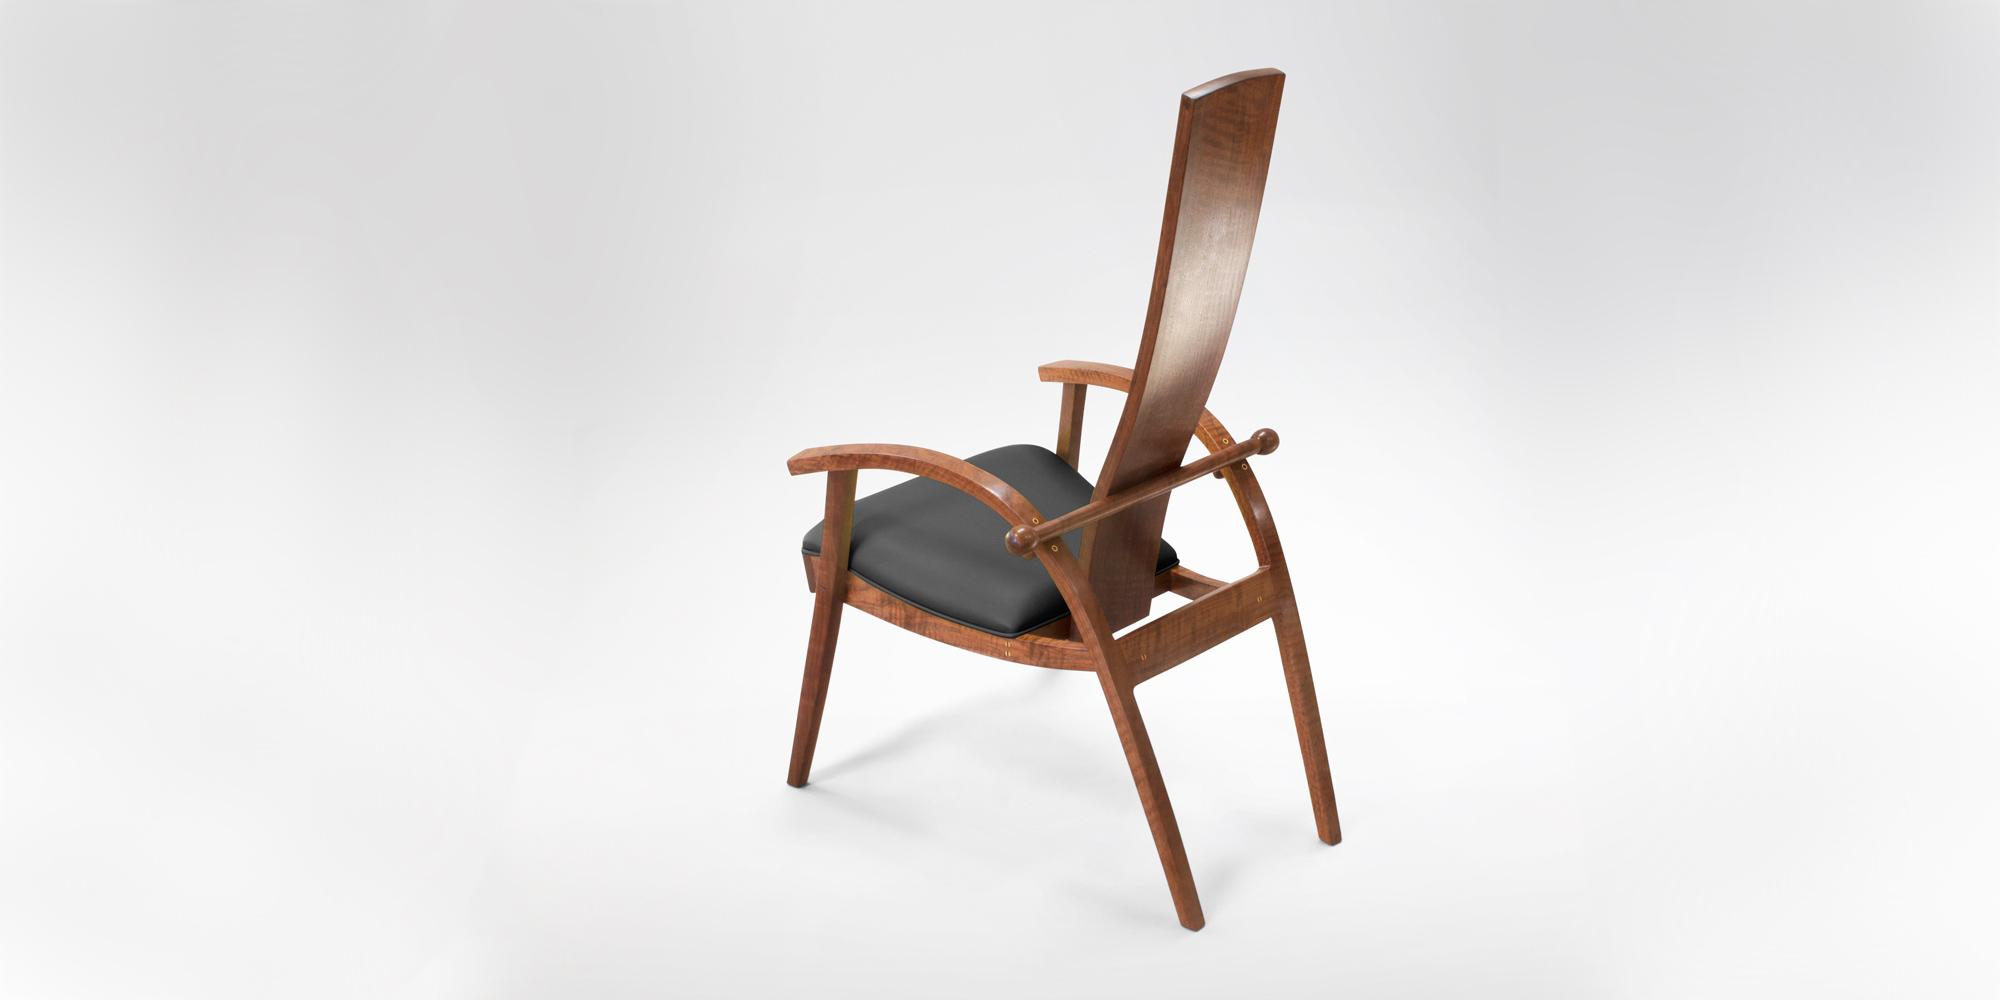 Rear View of the handmade Tashjian Chair w/ hand-sewn upholstery